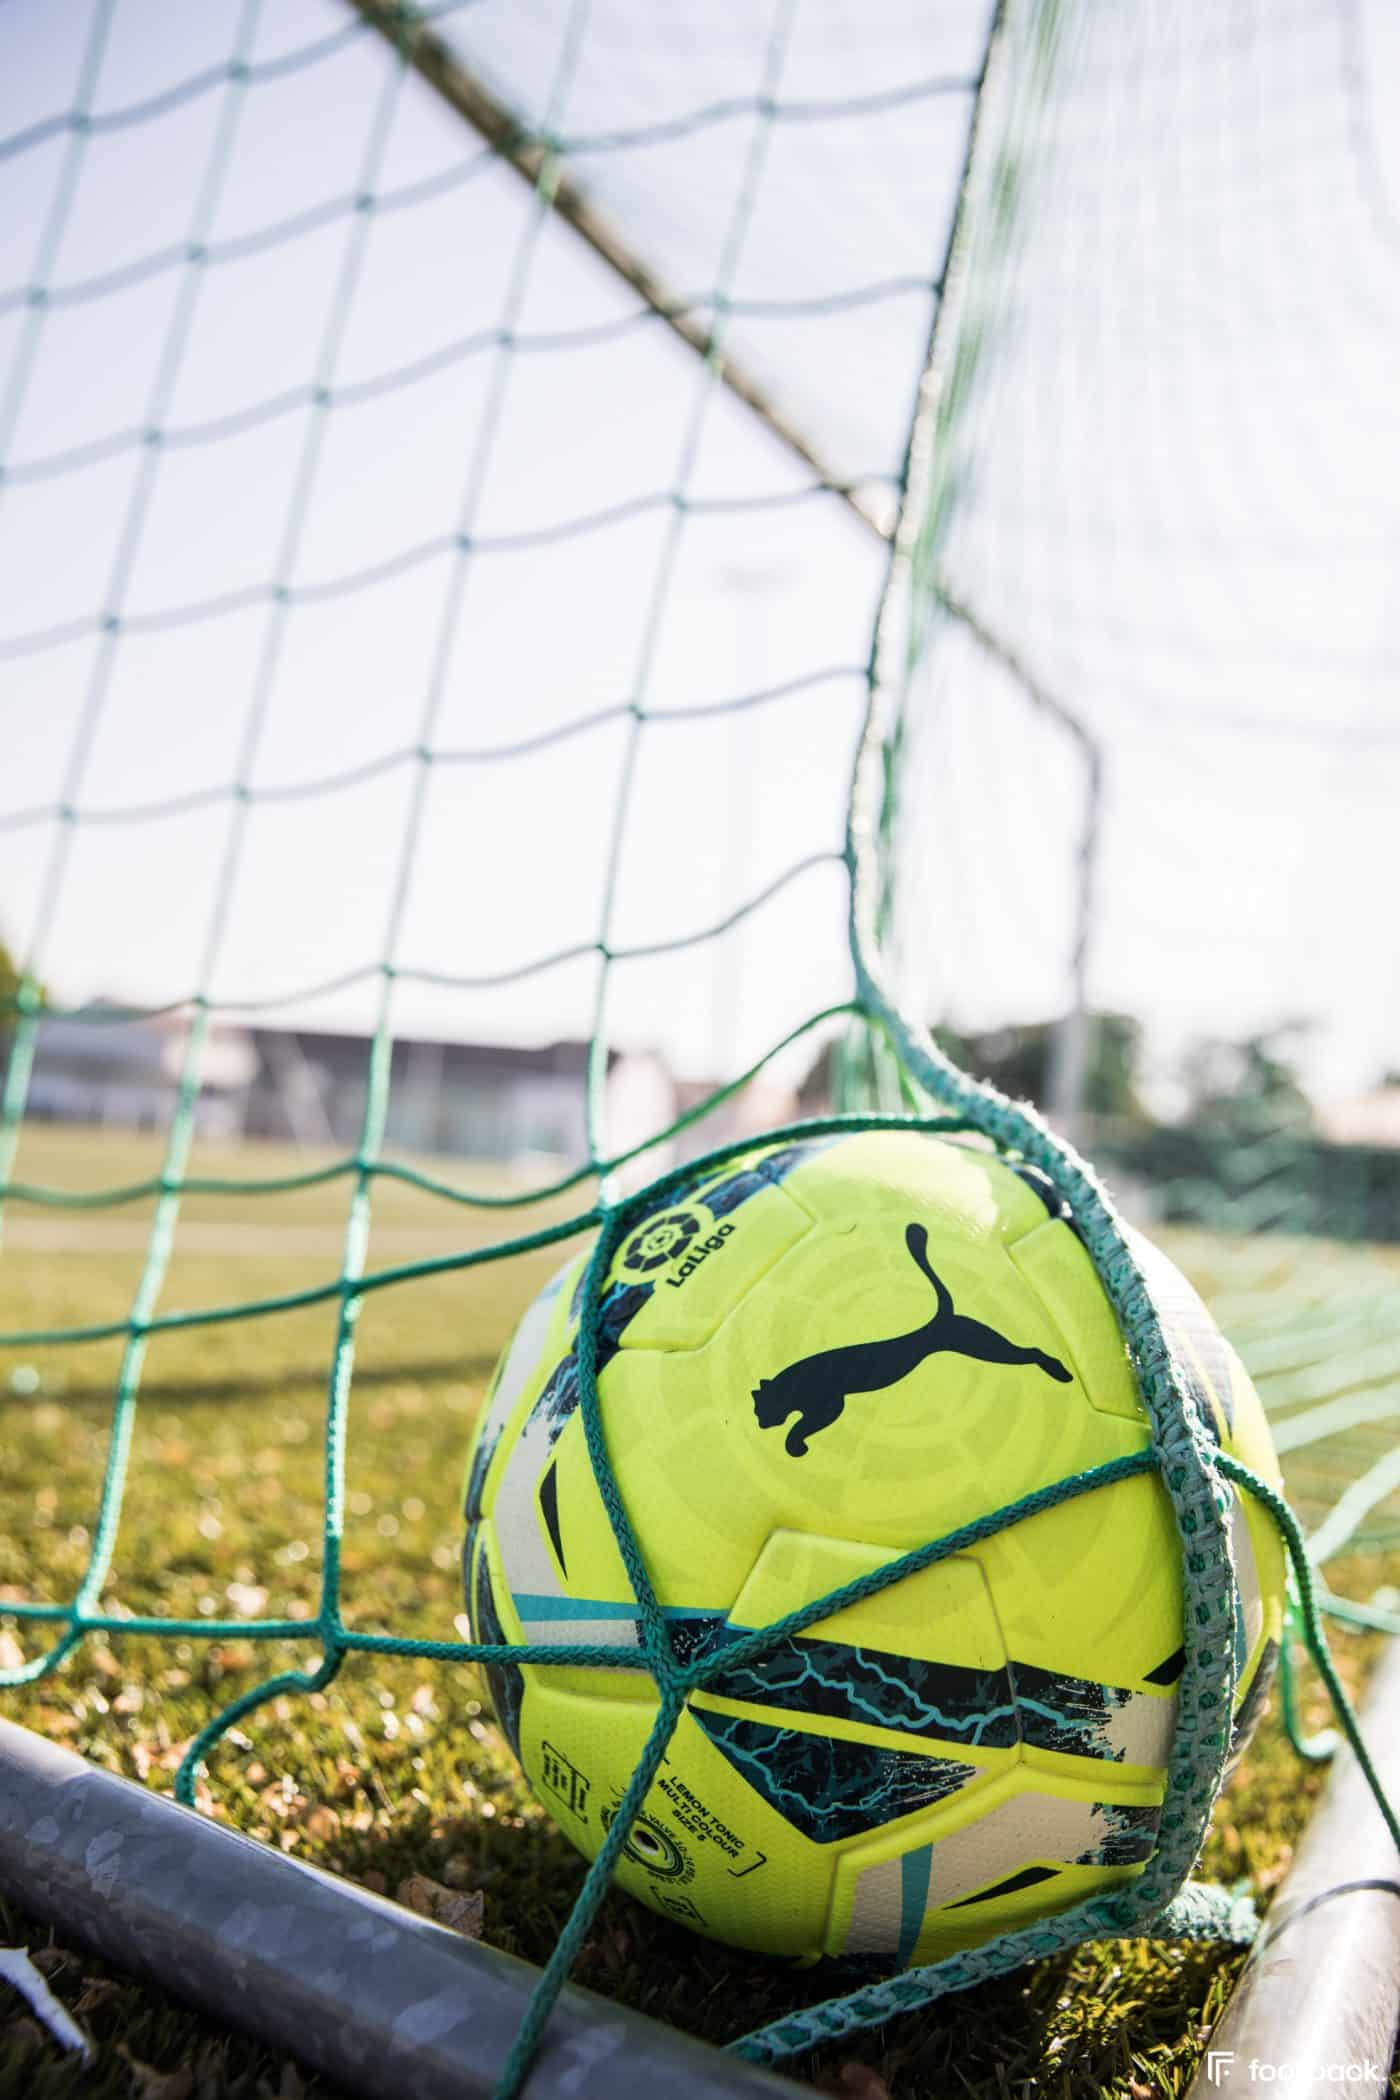 ballon-puma-barcelone-real-madrid-footpack-puma-liga-ball-footapck-11